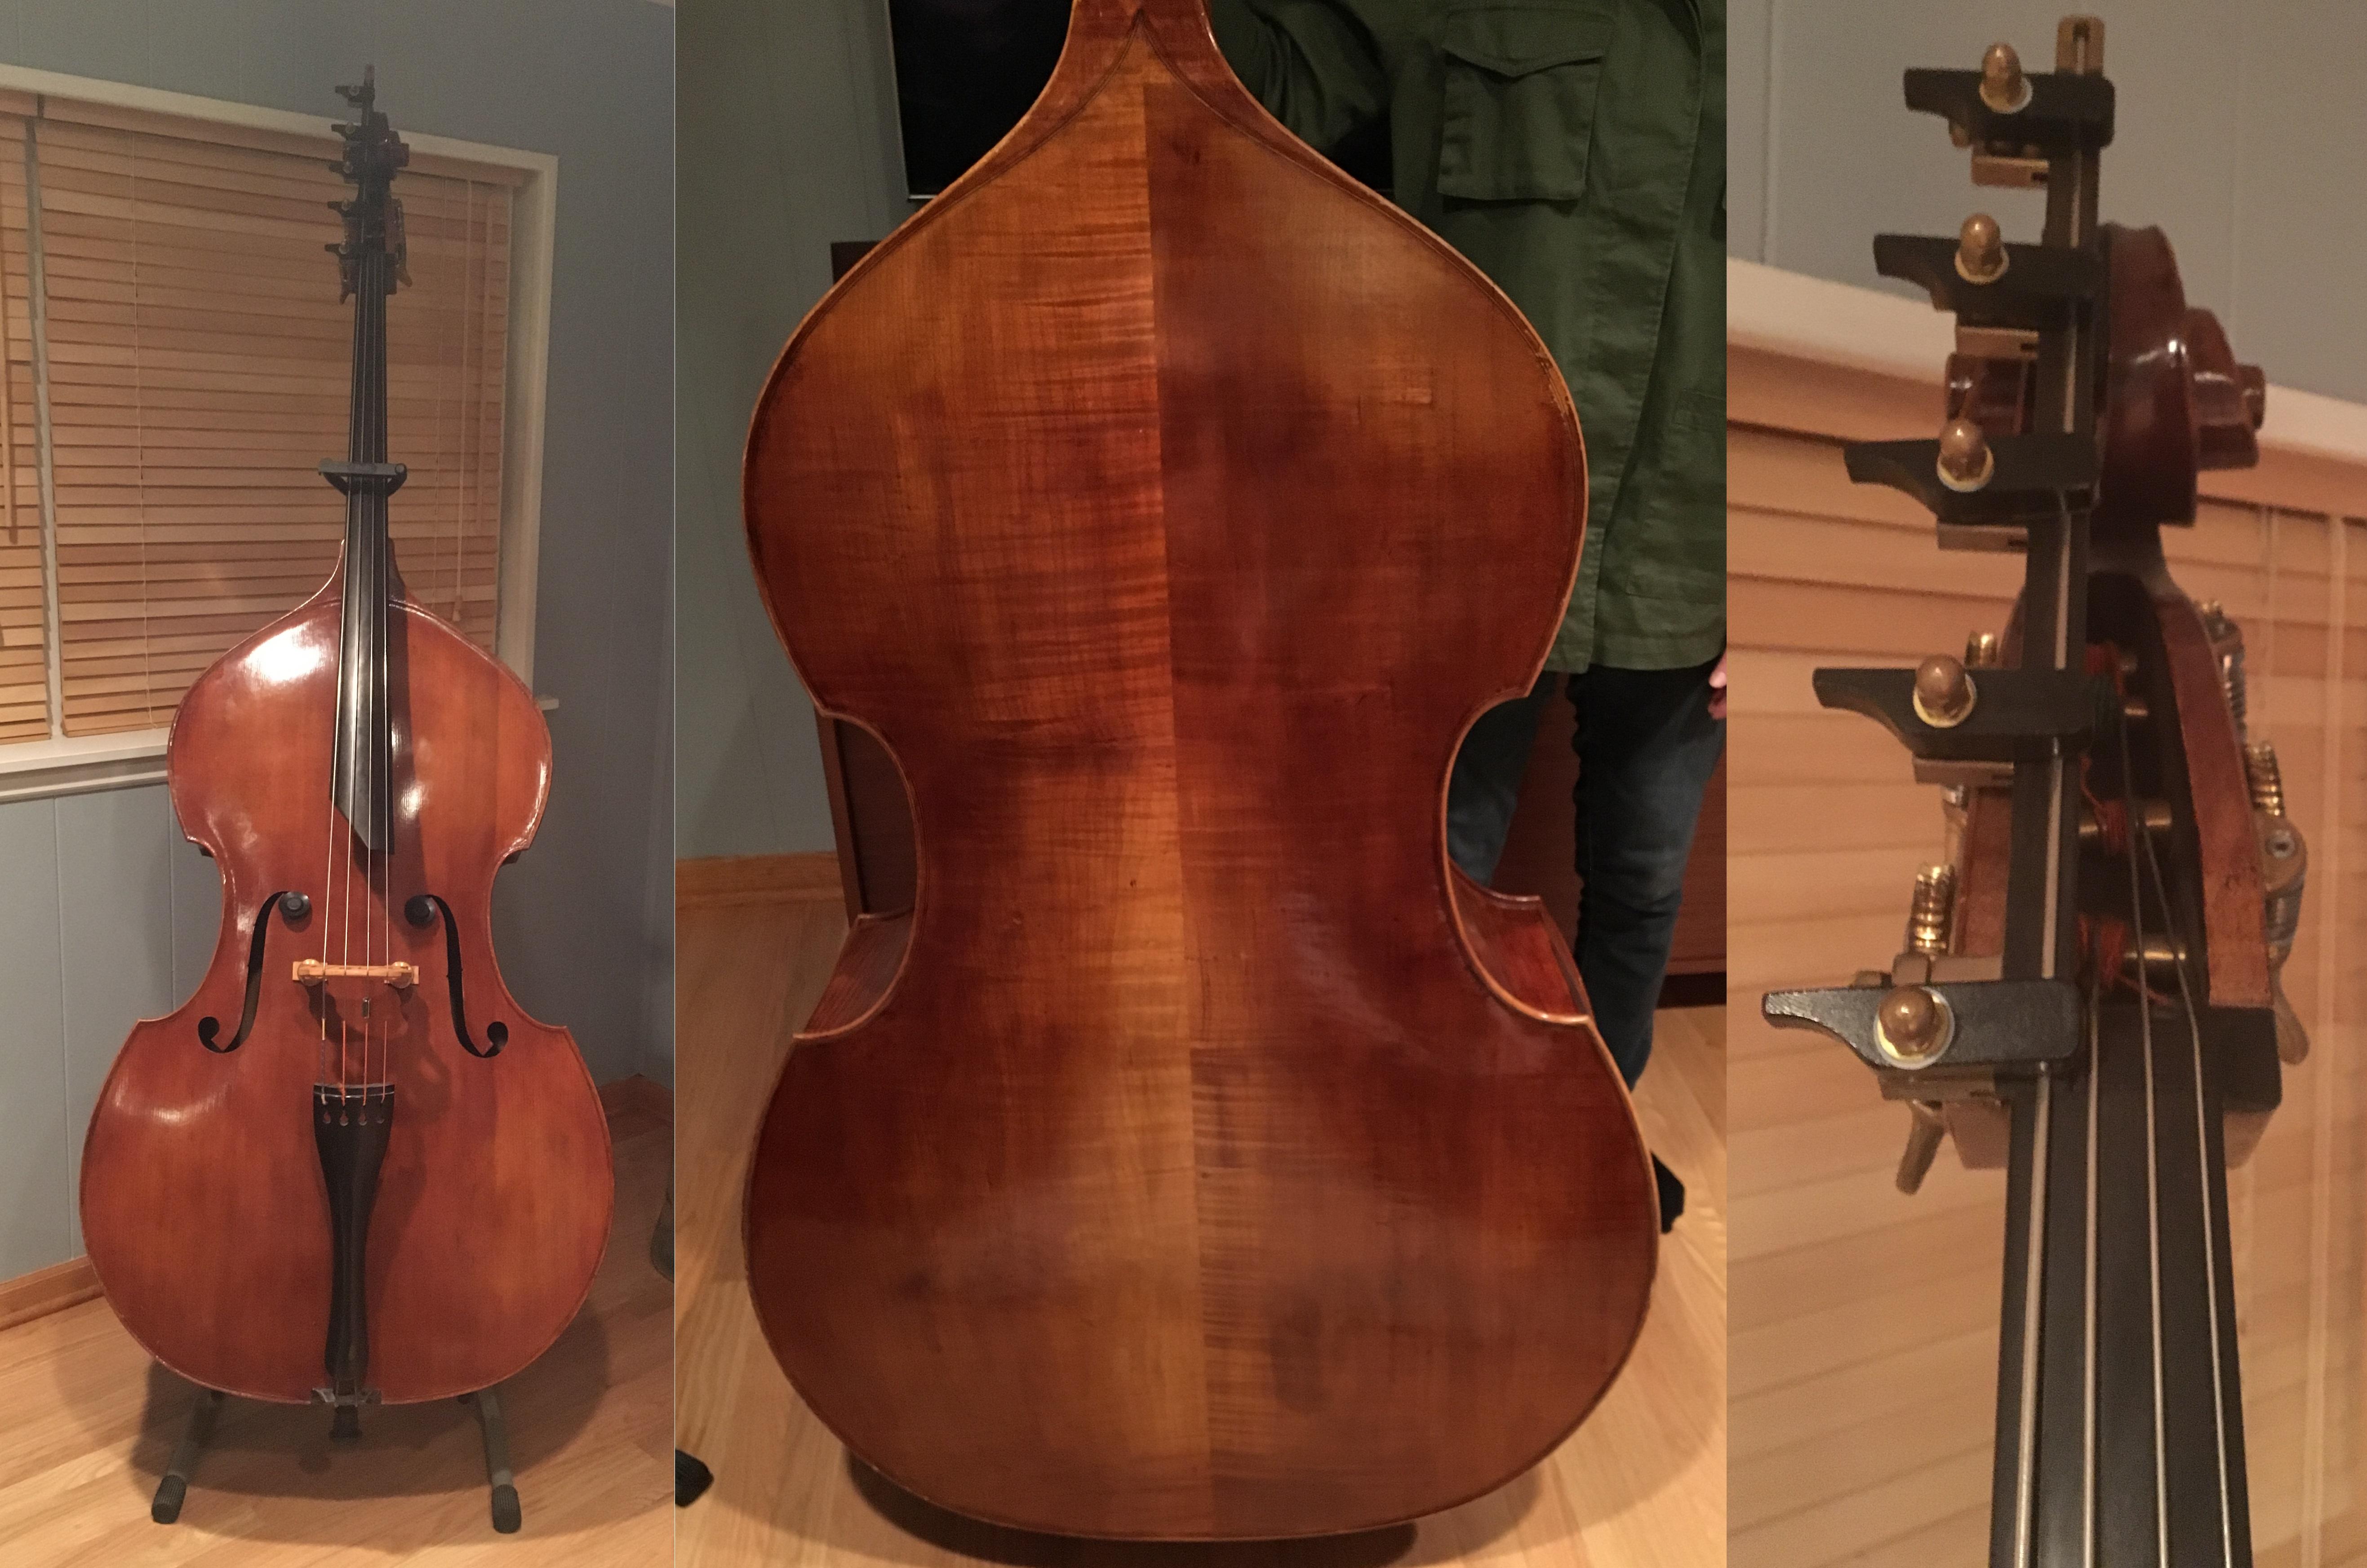 Old wood minerale interior of violin - Blake Maley Arlington Heights Il